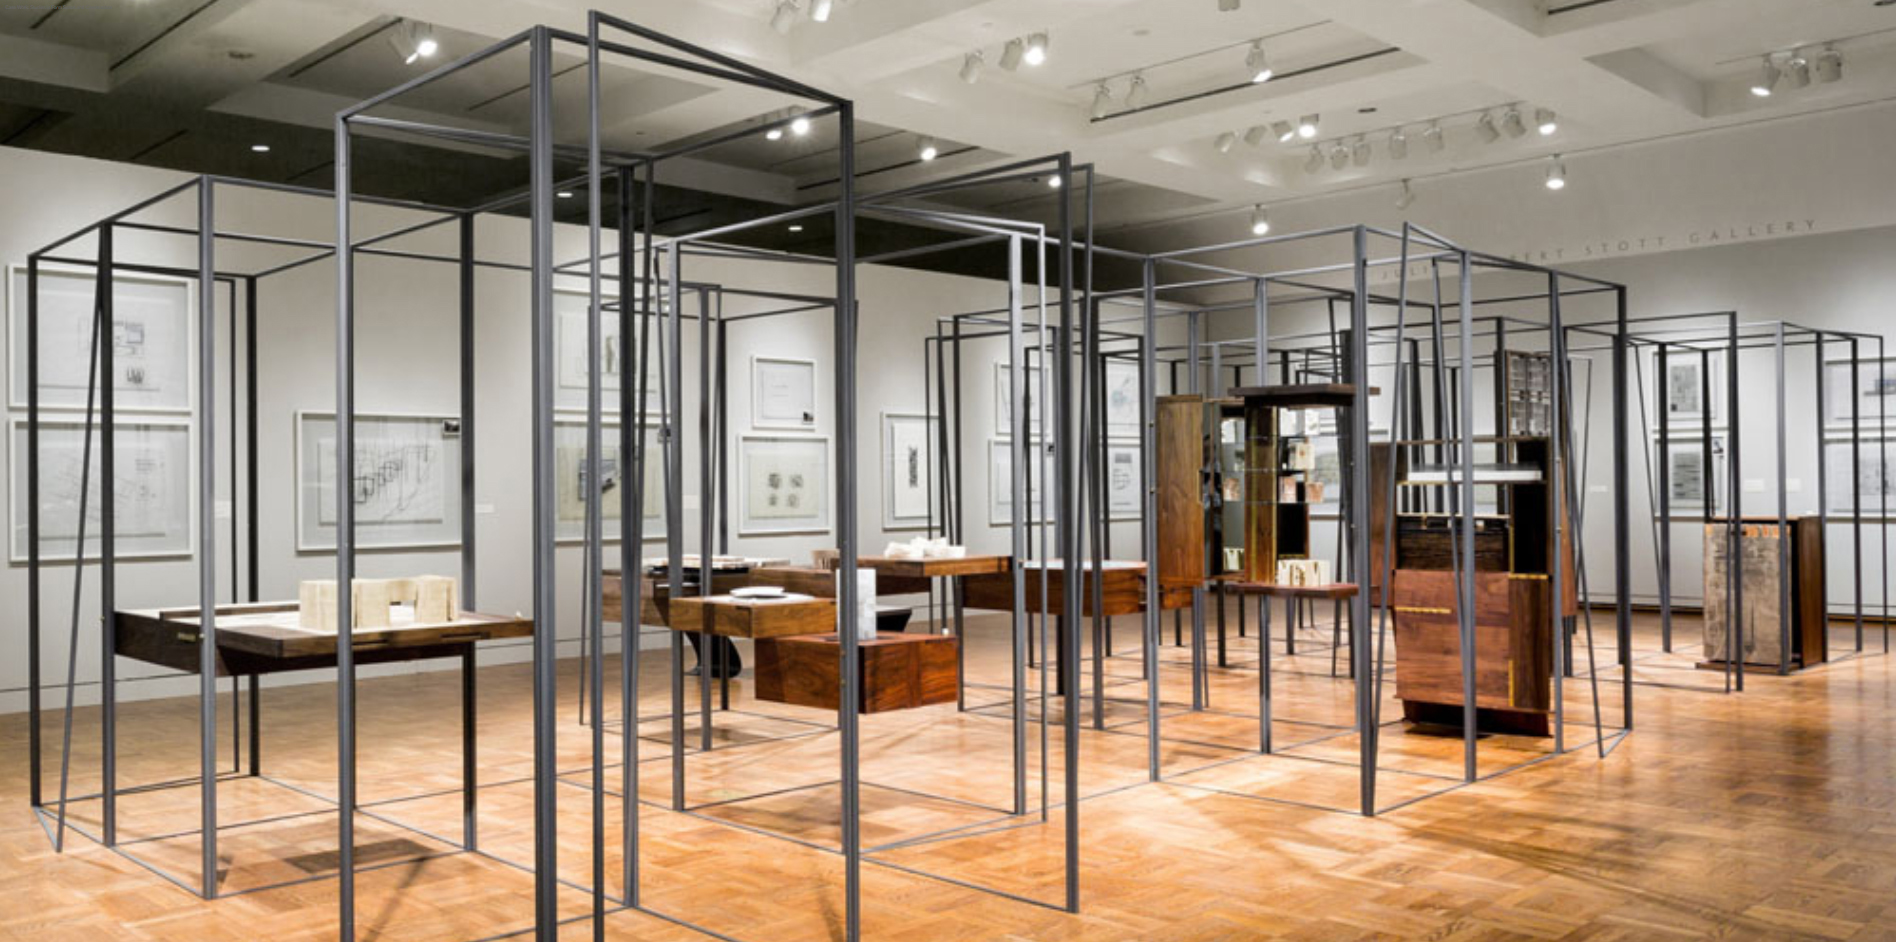 Case Work in Denver Art Museum